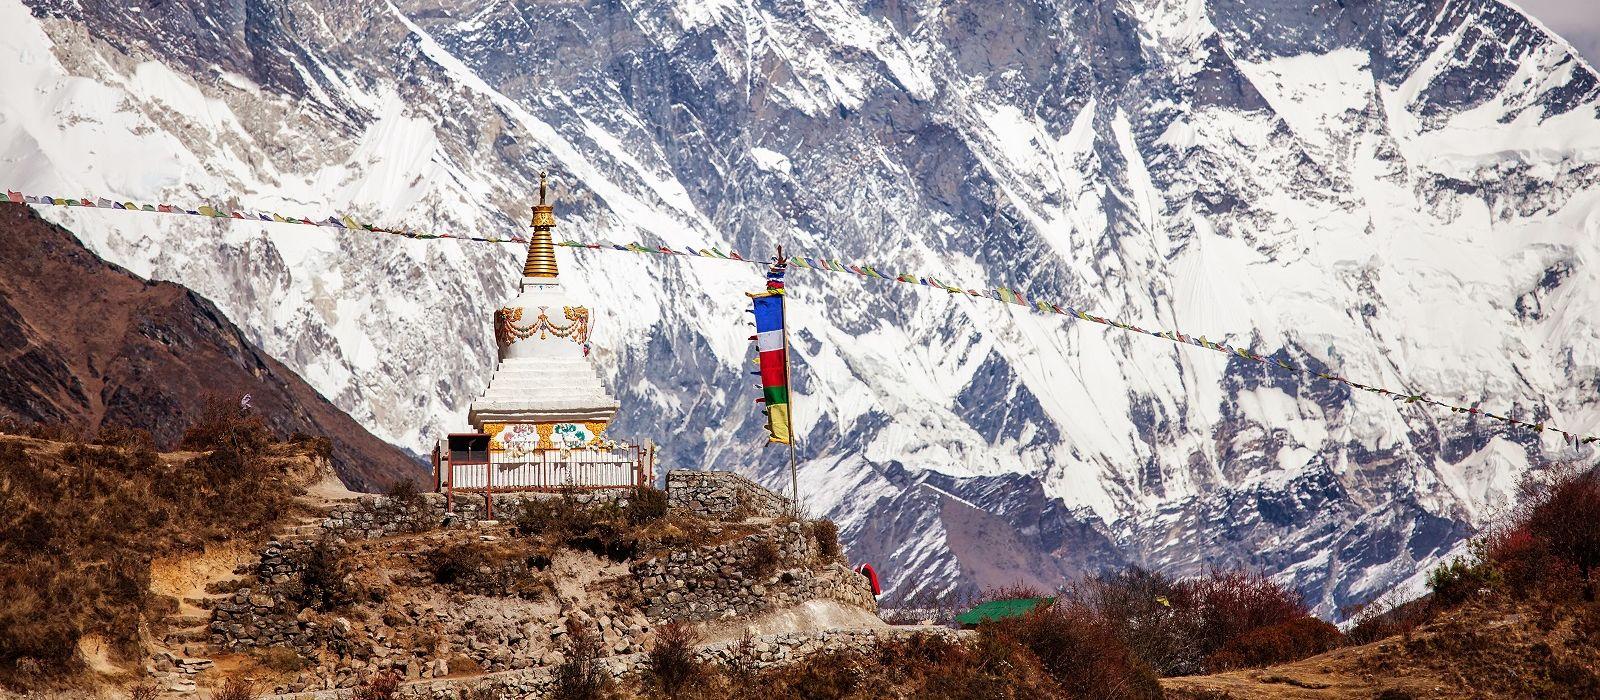 Highlights der Himalayas: Nepal, Bhutan und Tibet Urlaub 3